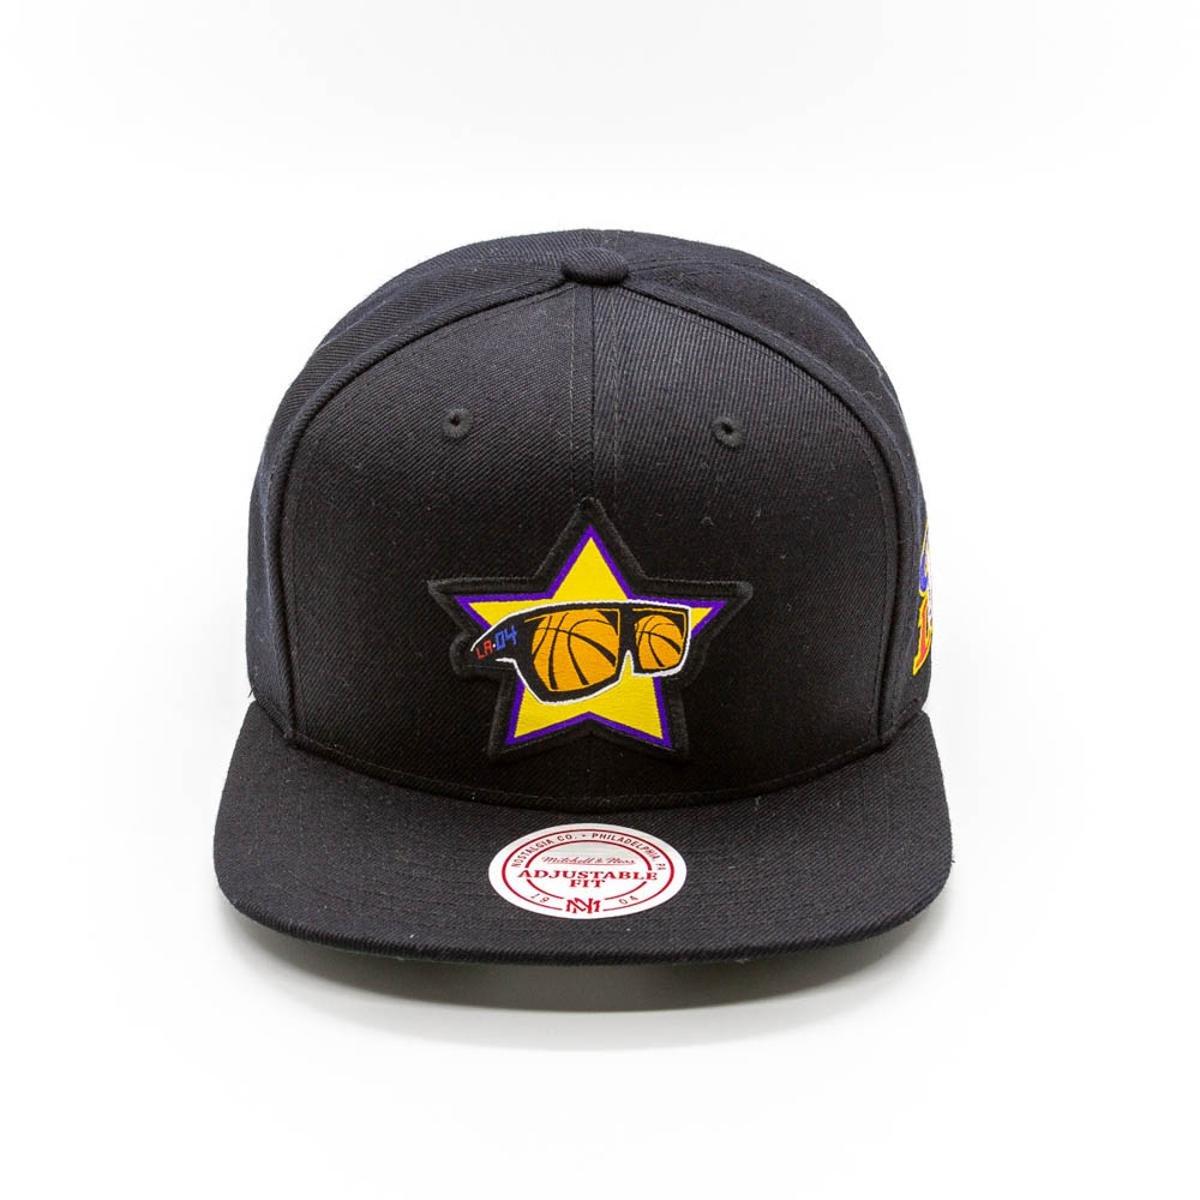 069376c95c756 Boné Mitchell   Ness All Star NBA Snapback - Preto - Compre Agora ...